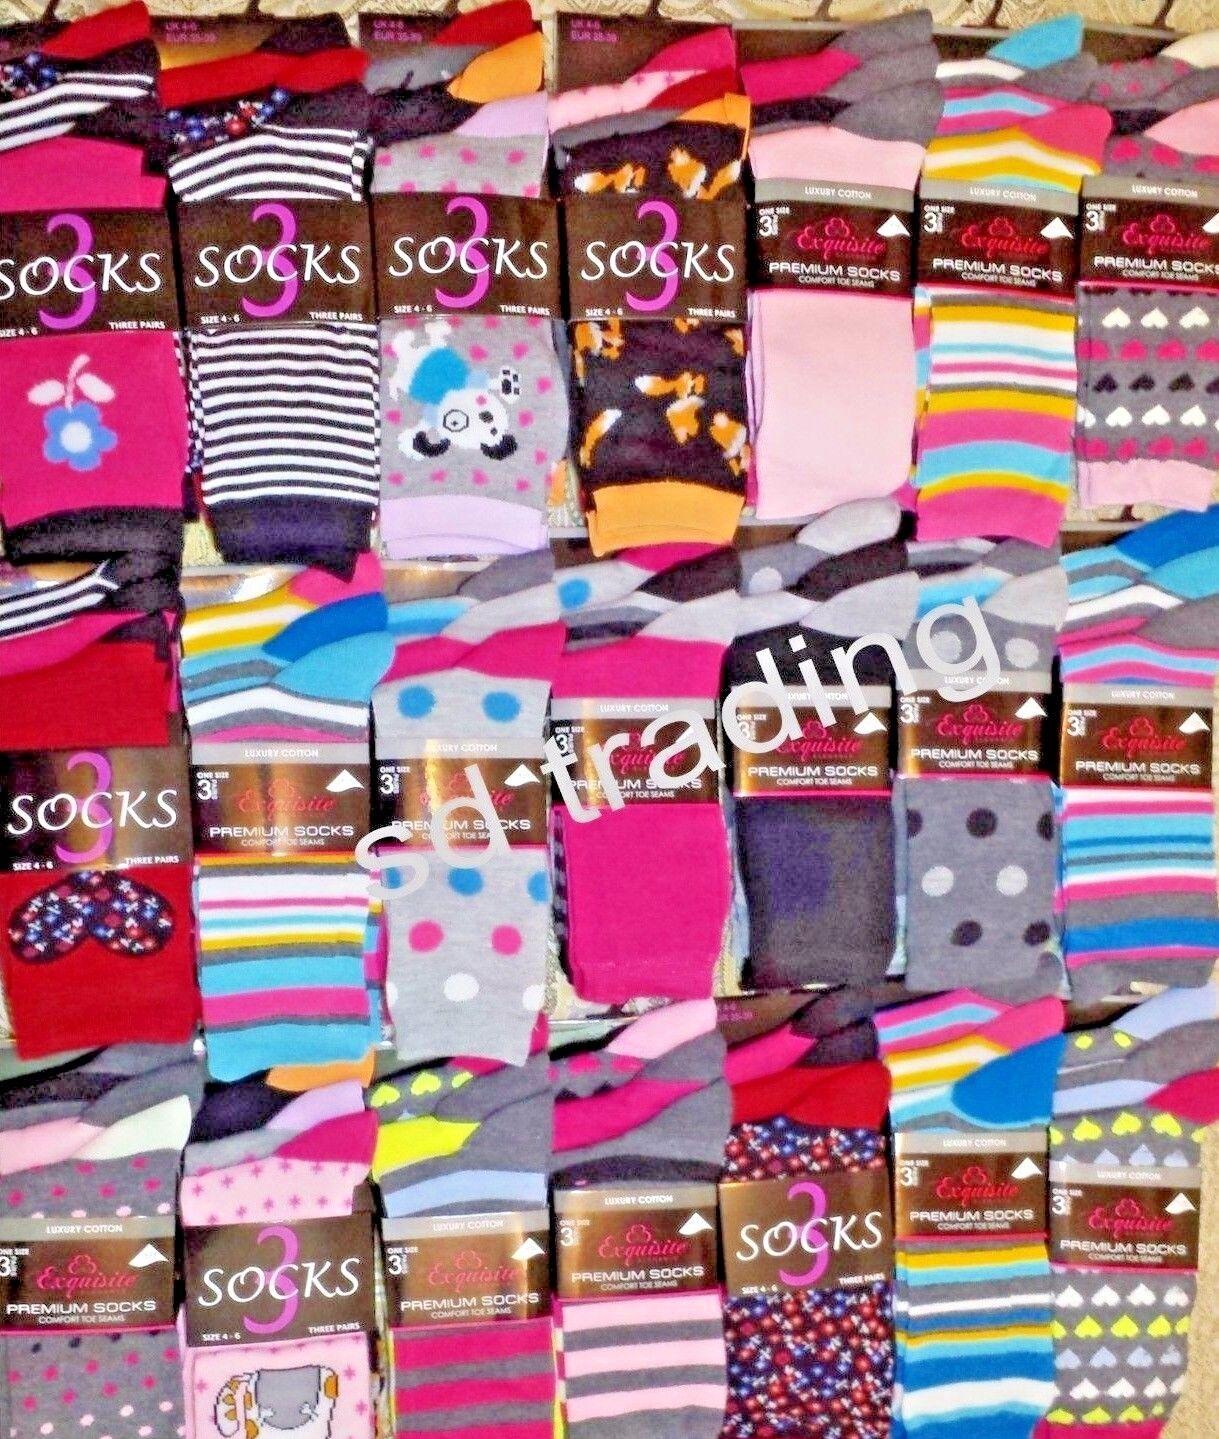 24 Christmas Gift Ladies Women Designer Socks Wholesale Job Lot Clearance